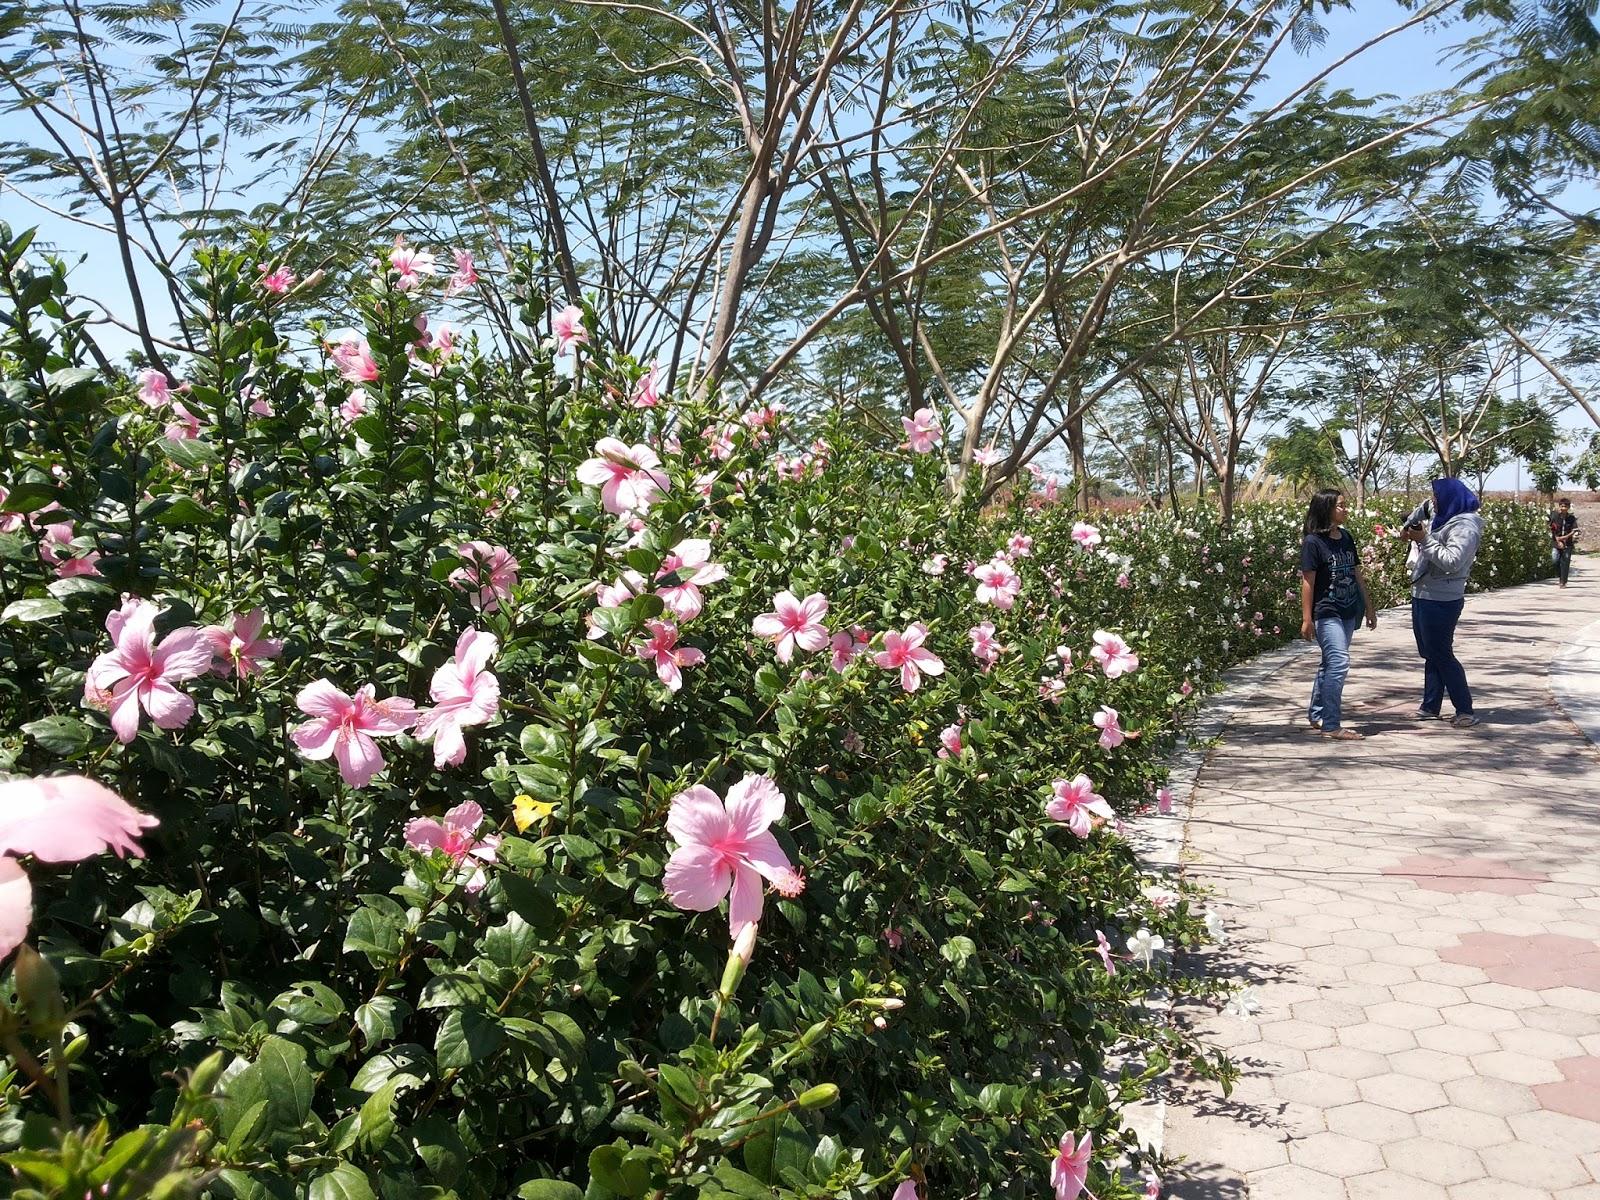 Jouerny Hutan Bambu Taman Sakura Surabaya Keputih Kota